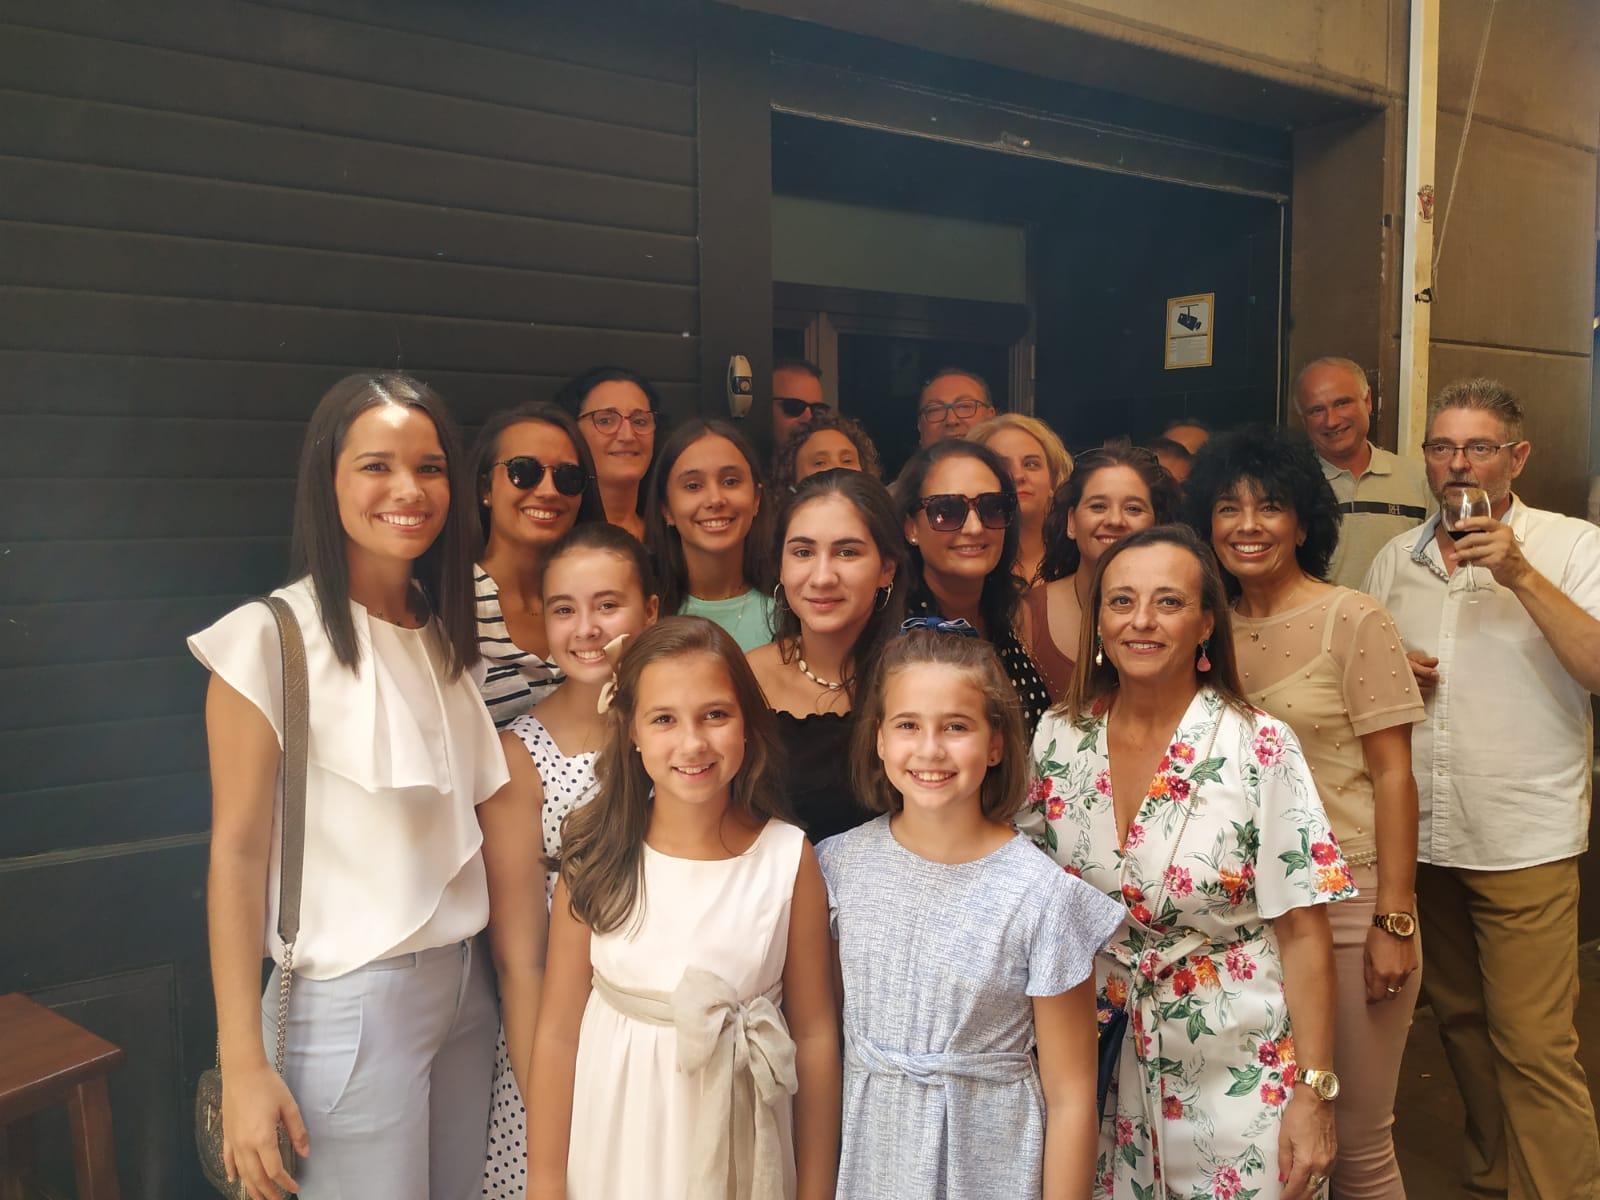 AniversariofundacionCastellon-2019-09-07-15-25-23